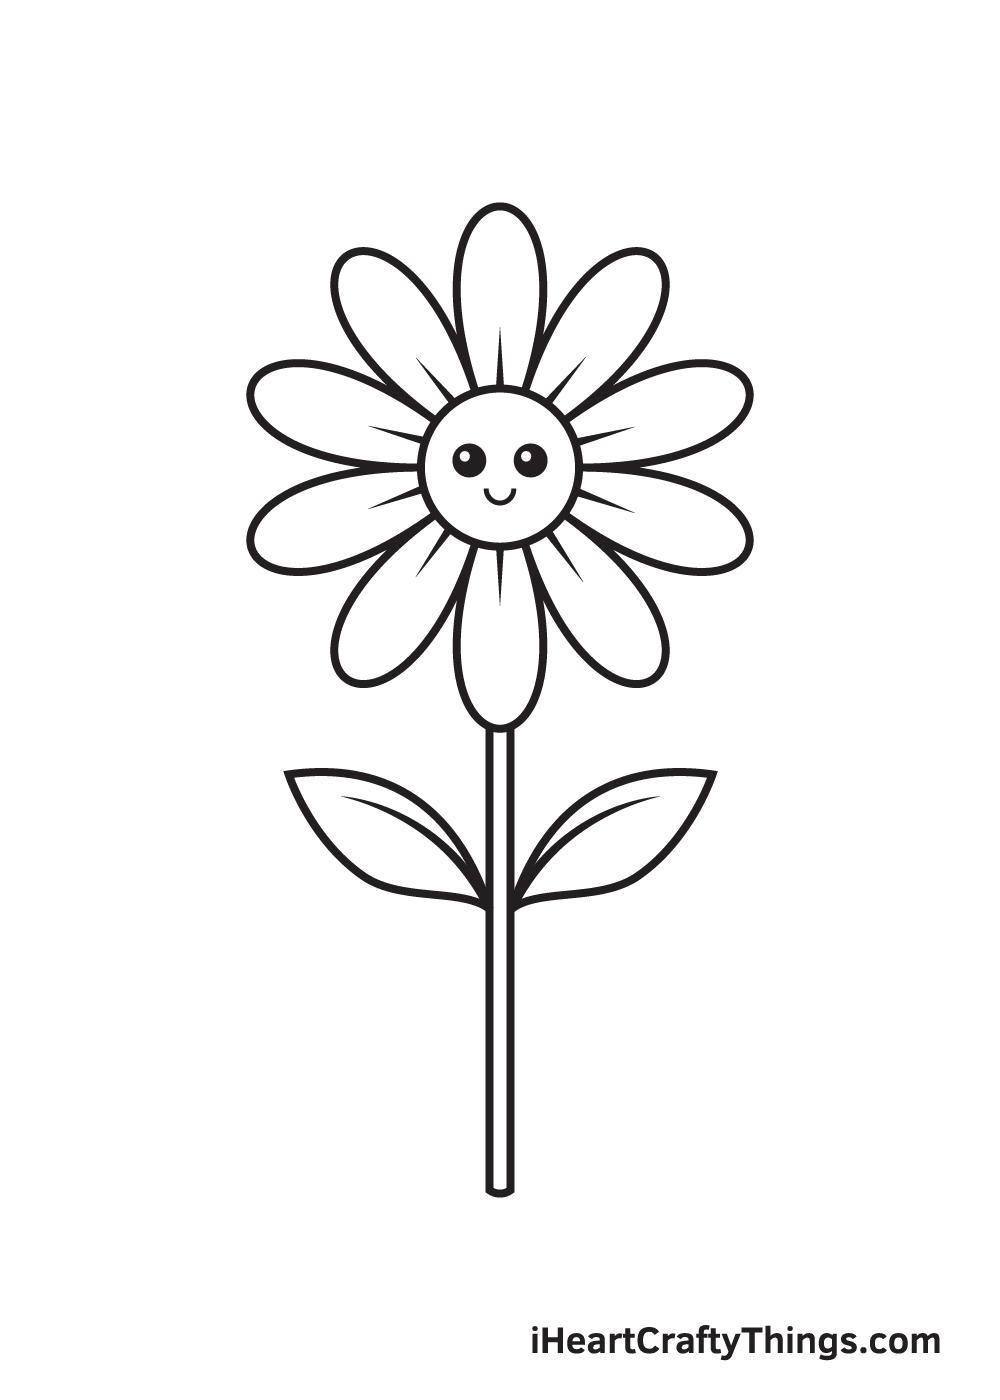 daisy drawing - step 9